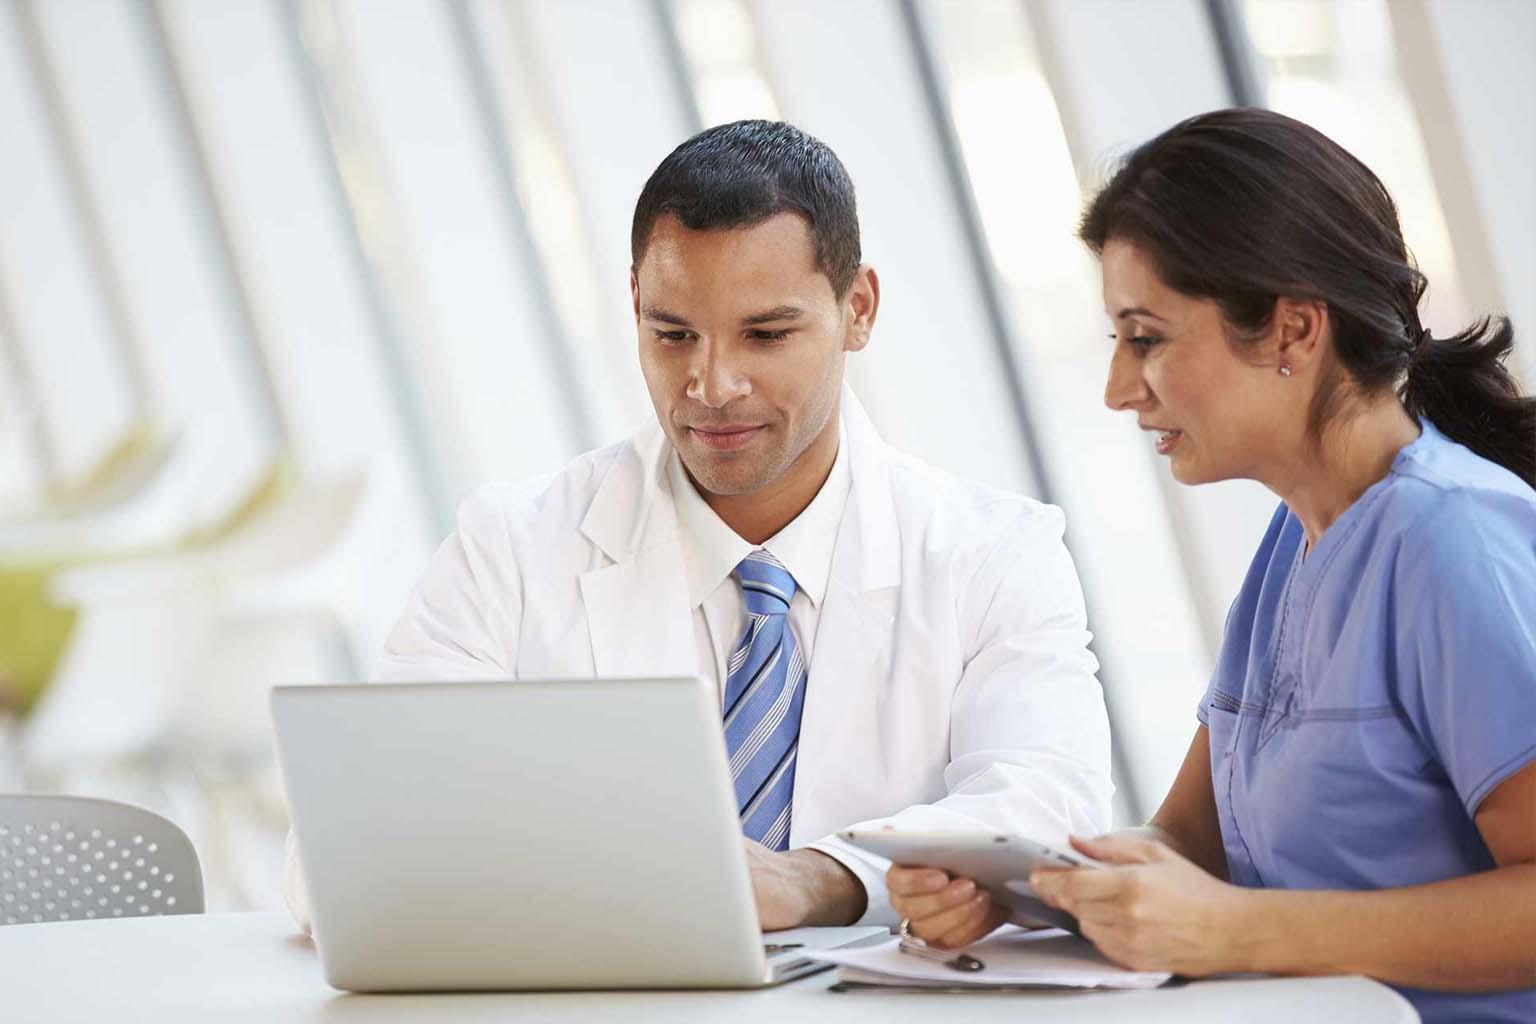 clinicians using laptop